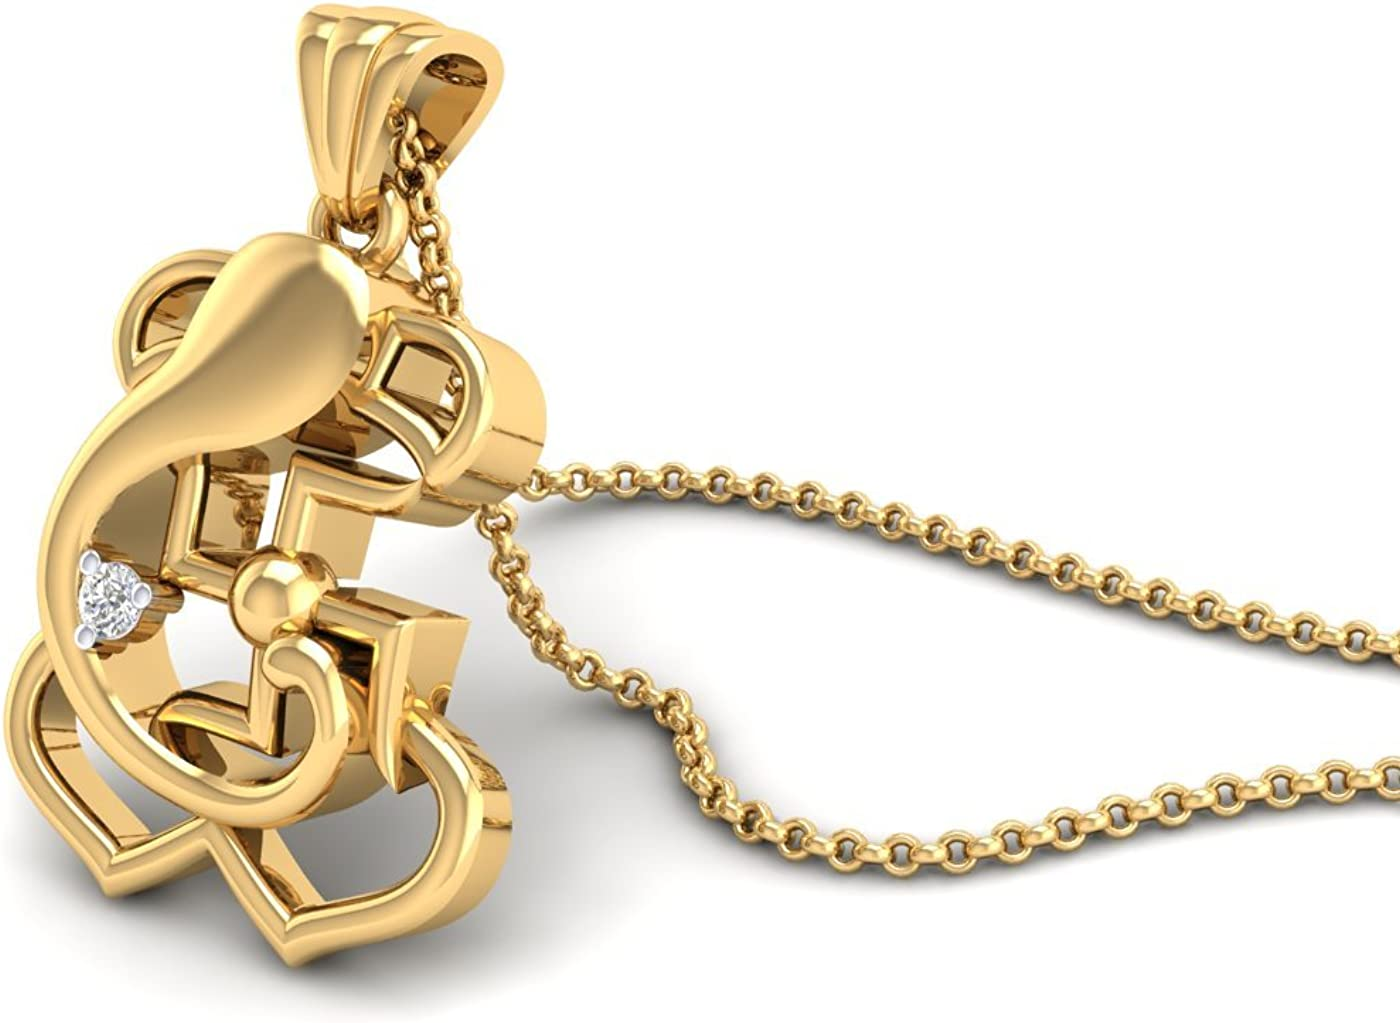 SwaraEcom 14K Yellow Gold Plated Round AAA Cubic Zirconia Ganesh//Ganesha//Ganpati Pendant Summer Sale